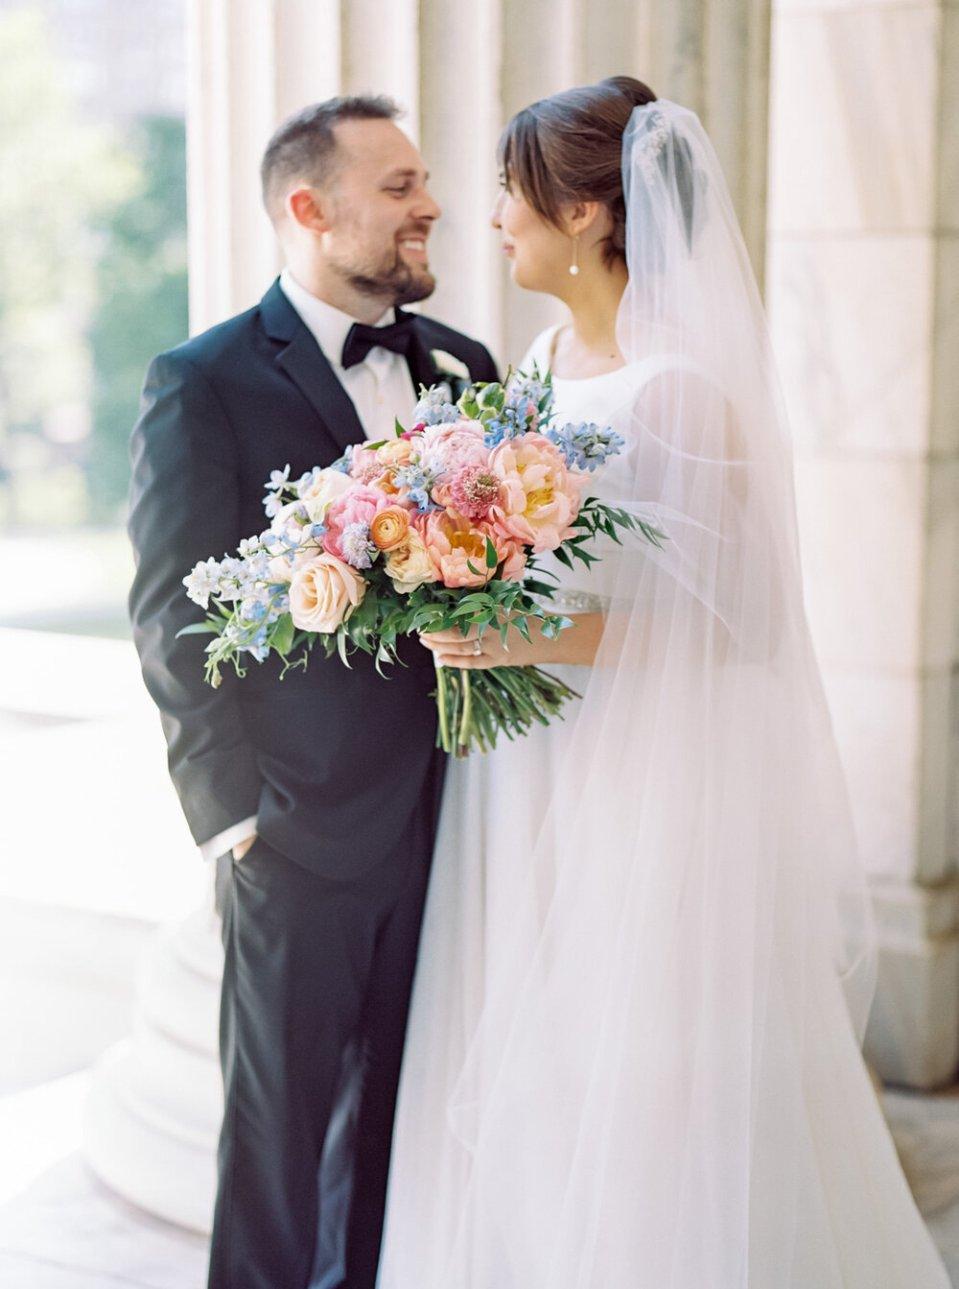 Bright and Joyful Cleveland Wedding Photography at Music Box Supper Club-288.jpg